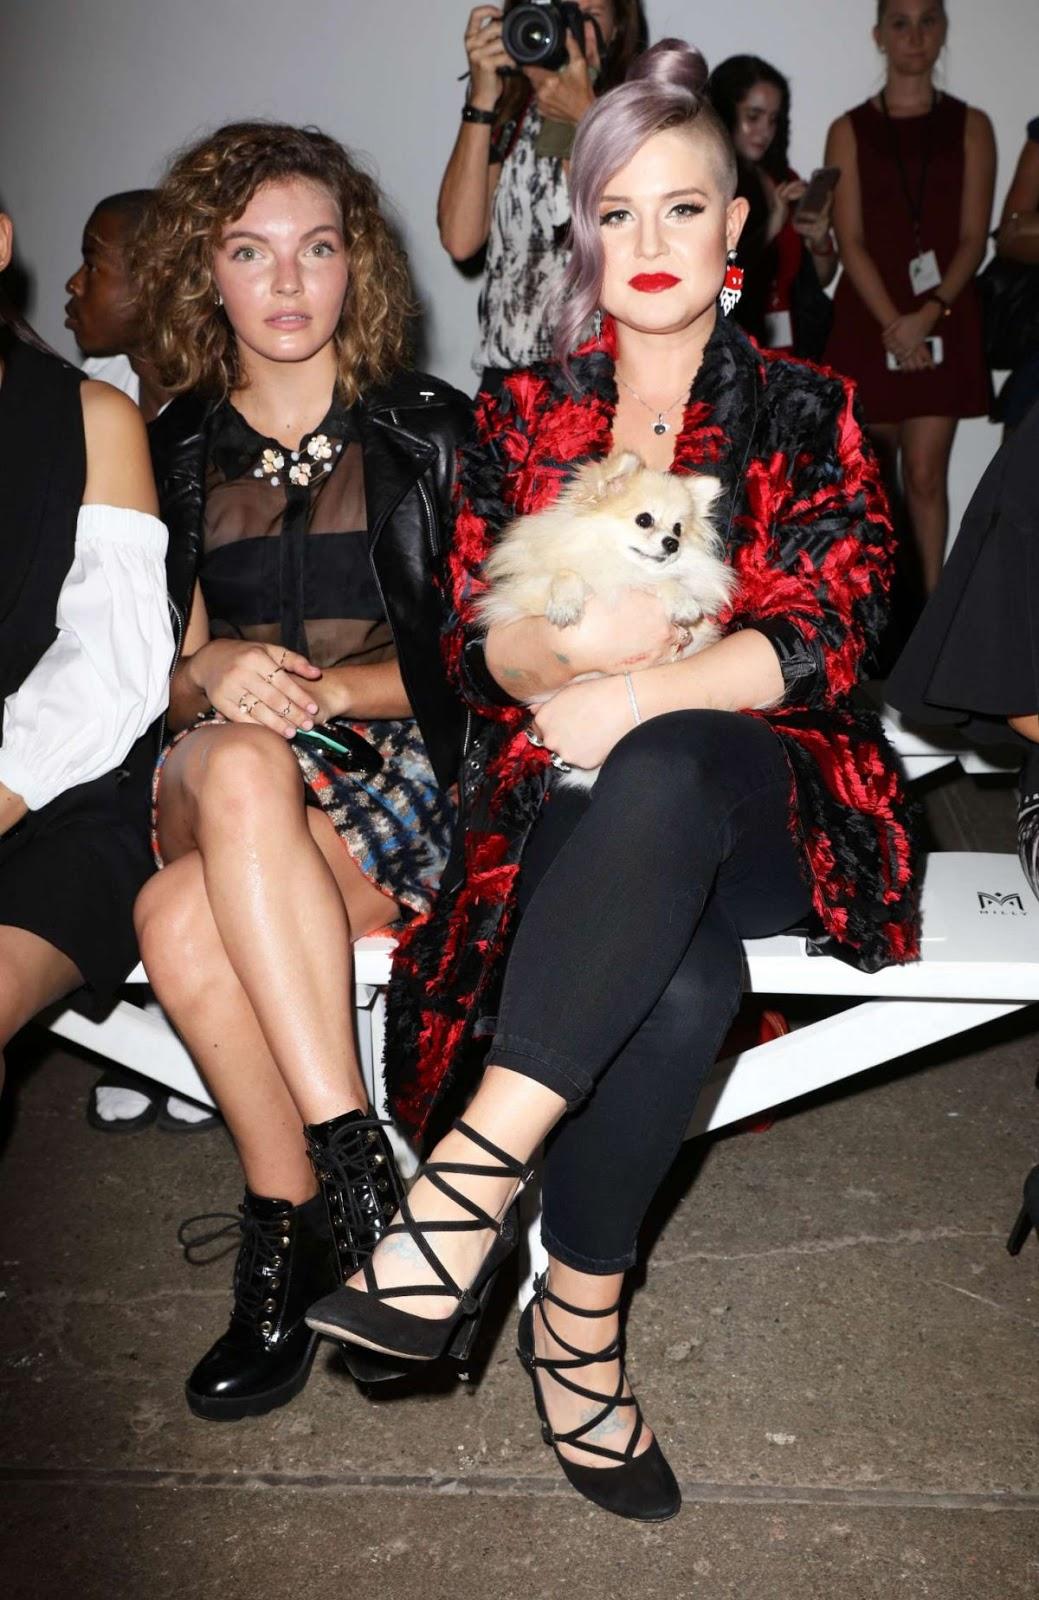 Camren Bicondova At Milly Fashion Show At 2016 New York Fashion Week